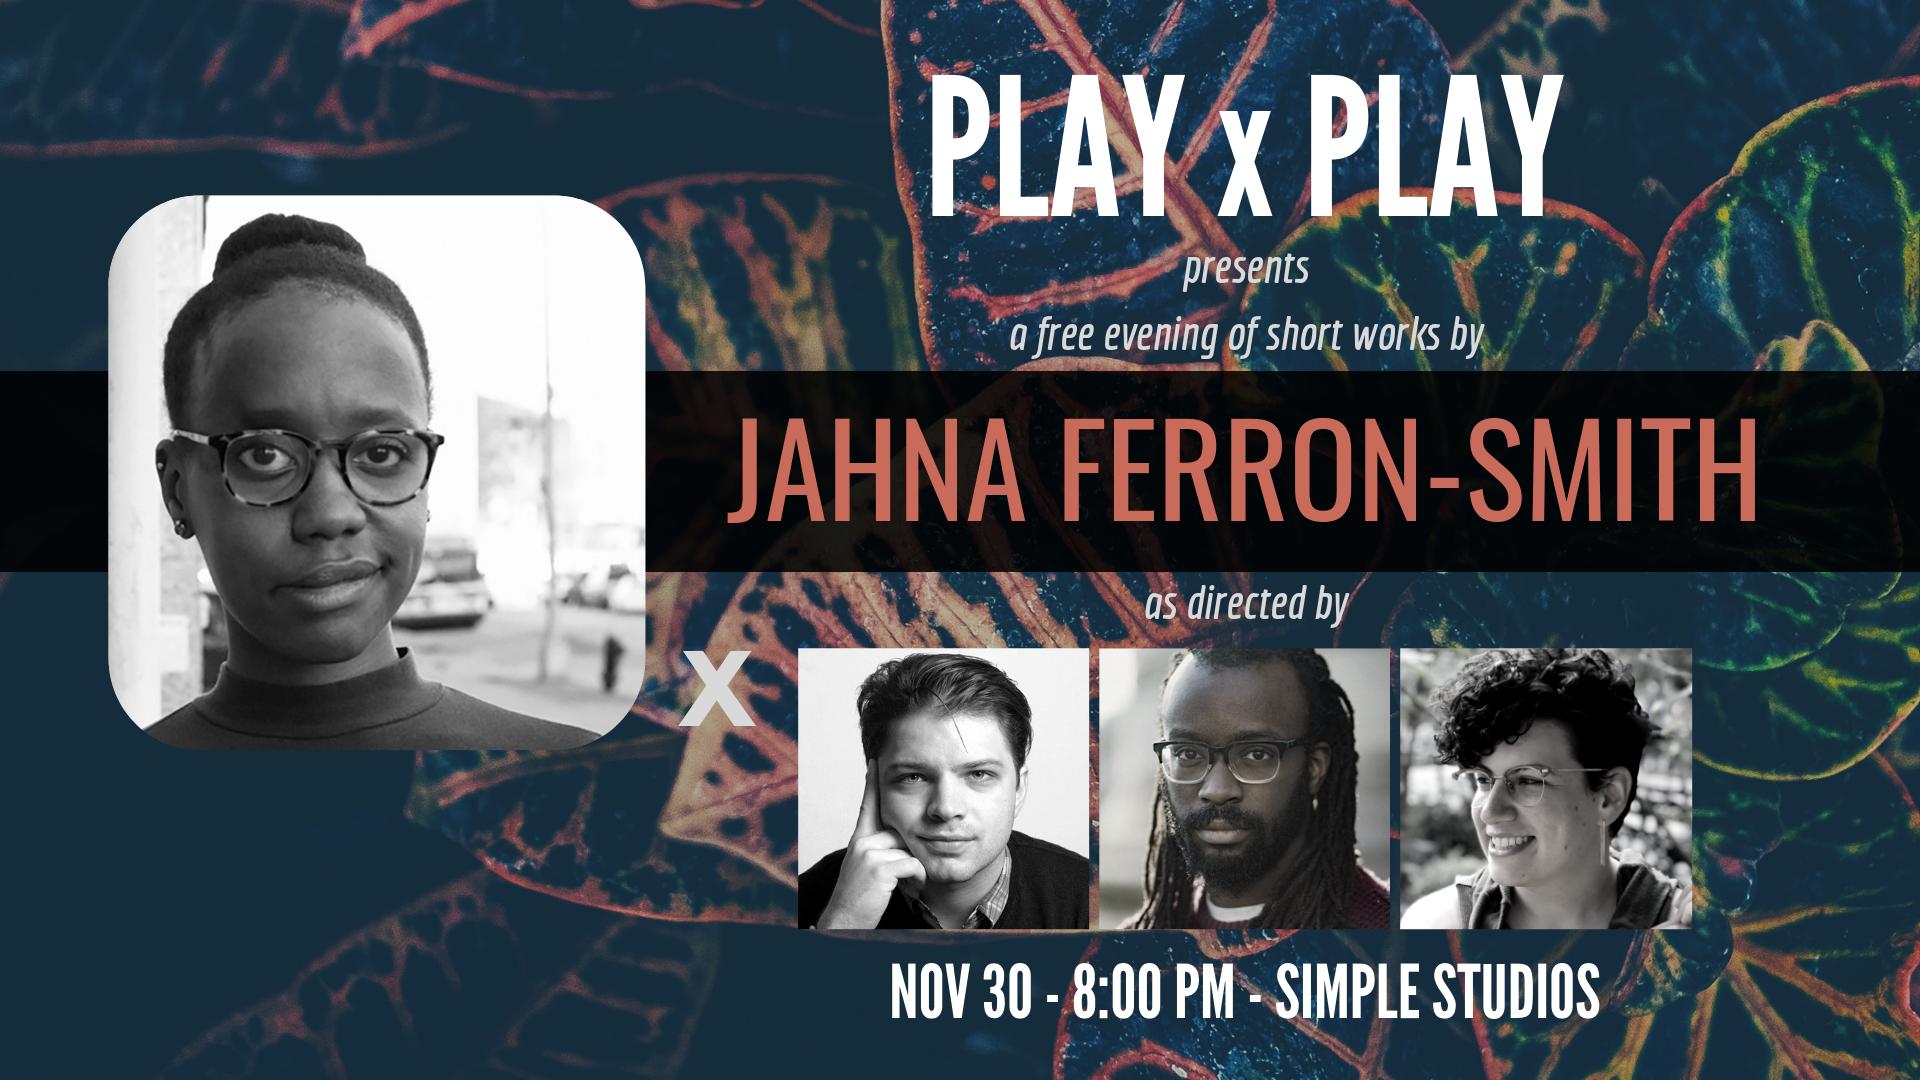 playxplay-2018-11-Jahna Ferron-Smith.png